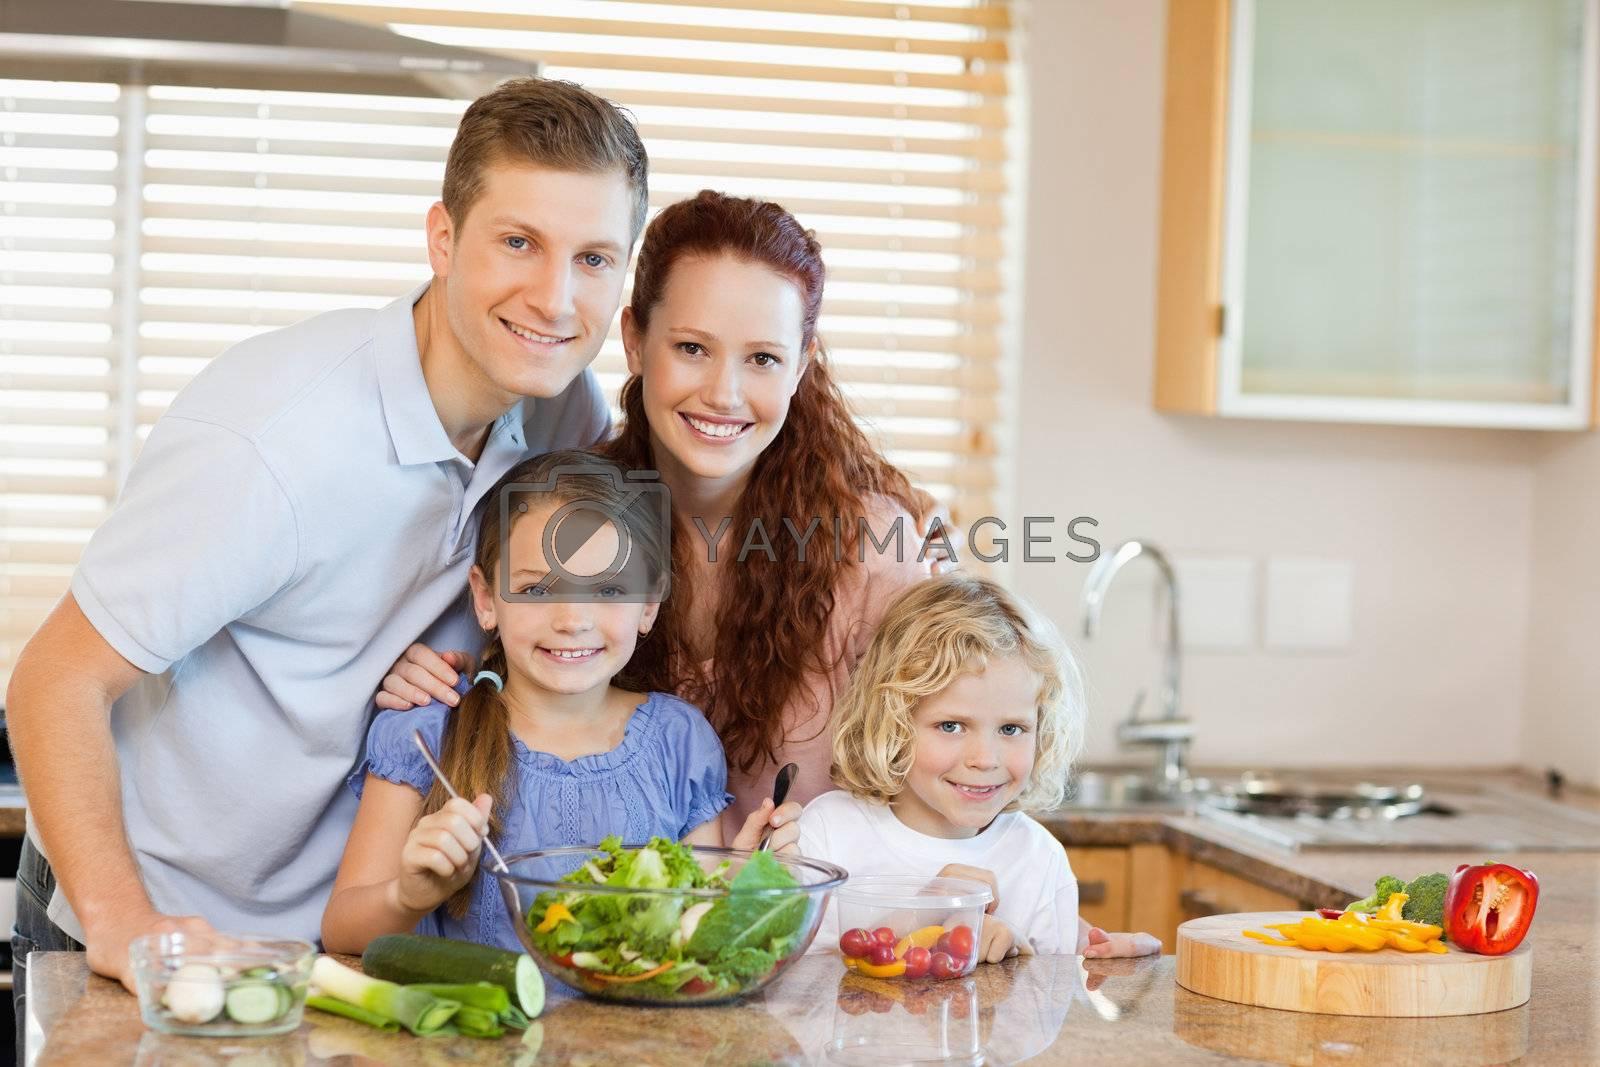 Family in the kitchen by Wavebreakmedia